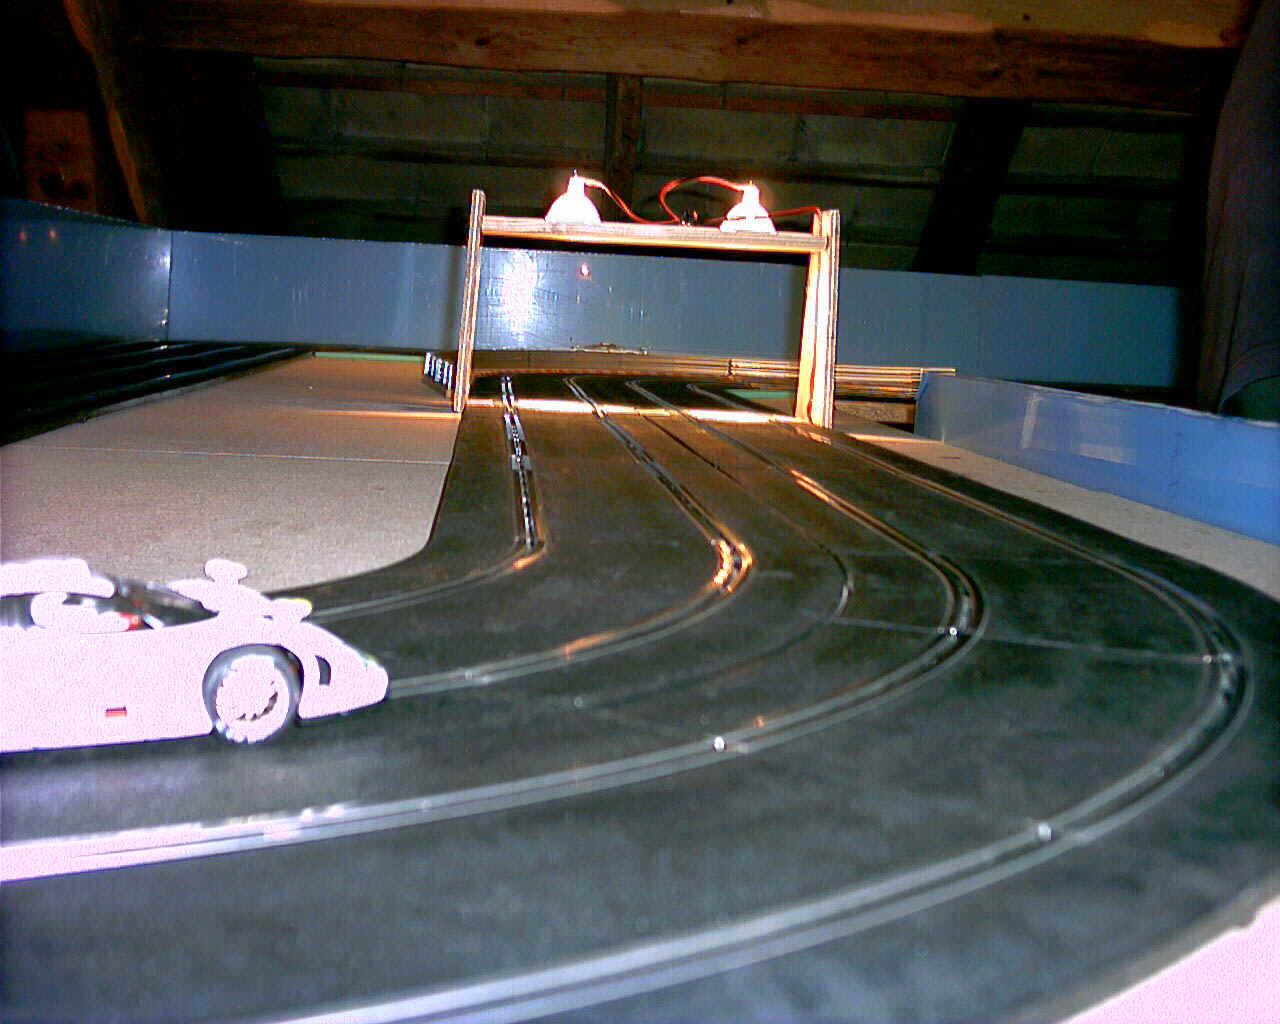 Slot Car Detector  Lane Slot Car Track Wiring Diagram on slot car controller schematic, quick car wiring diagram, race car wiring diagram, slot car track building, track switch diagram, slot car track lighting, stick shift diagram, slot car track power supply, electric motor bearings diagram, car lights diagram,